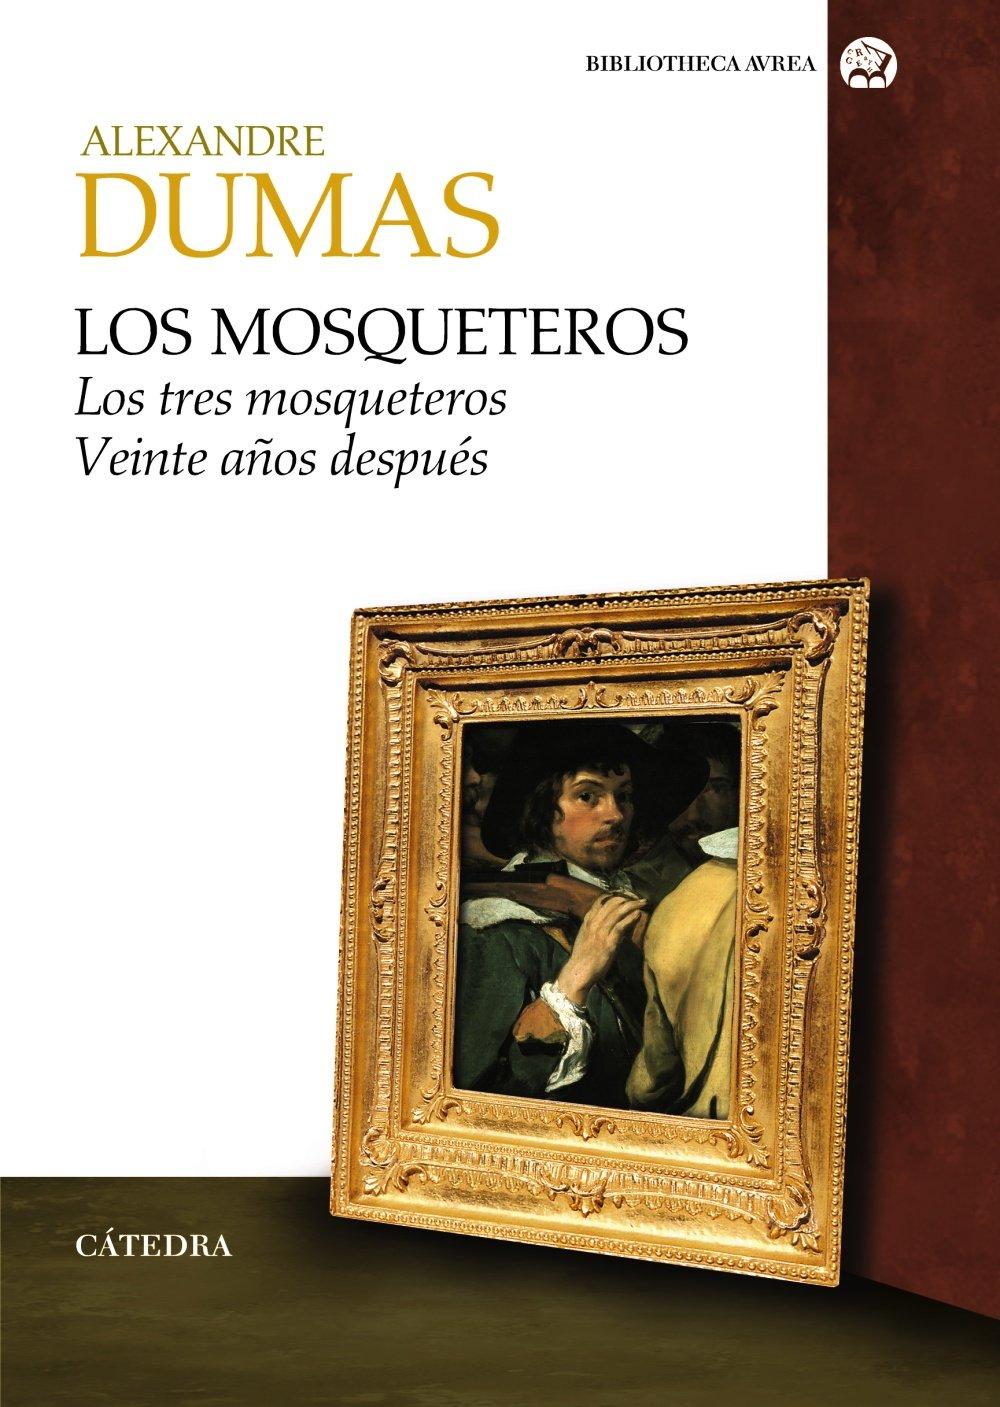 Download Los mosqueteros / The Musketeers: Los tres mosqueteros veinte años después / The Three Musketeers twenty years later (Spanish Edition) pdf